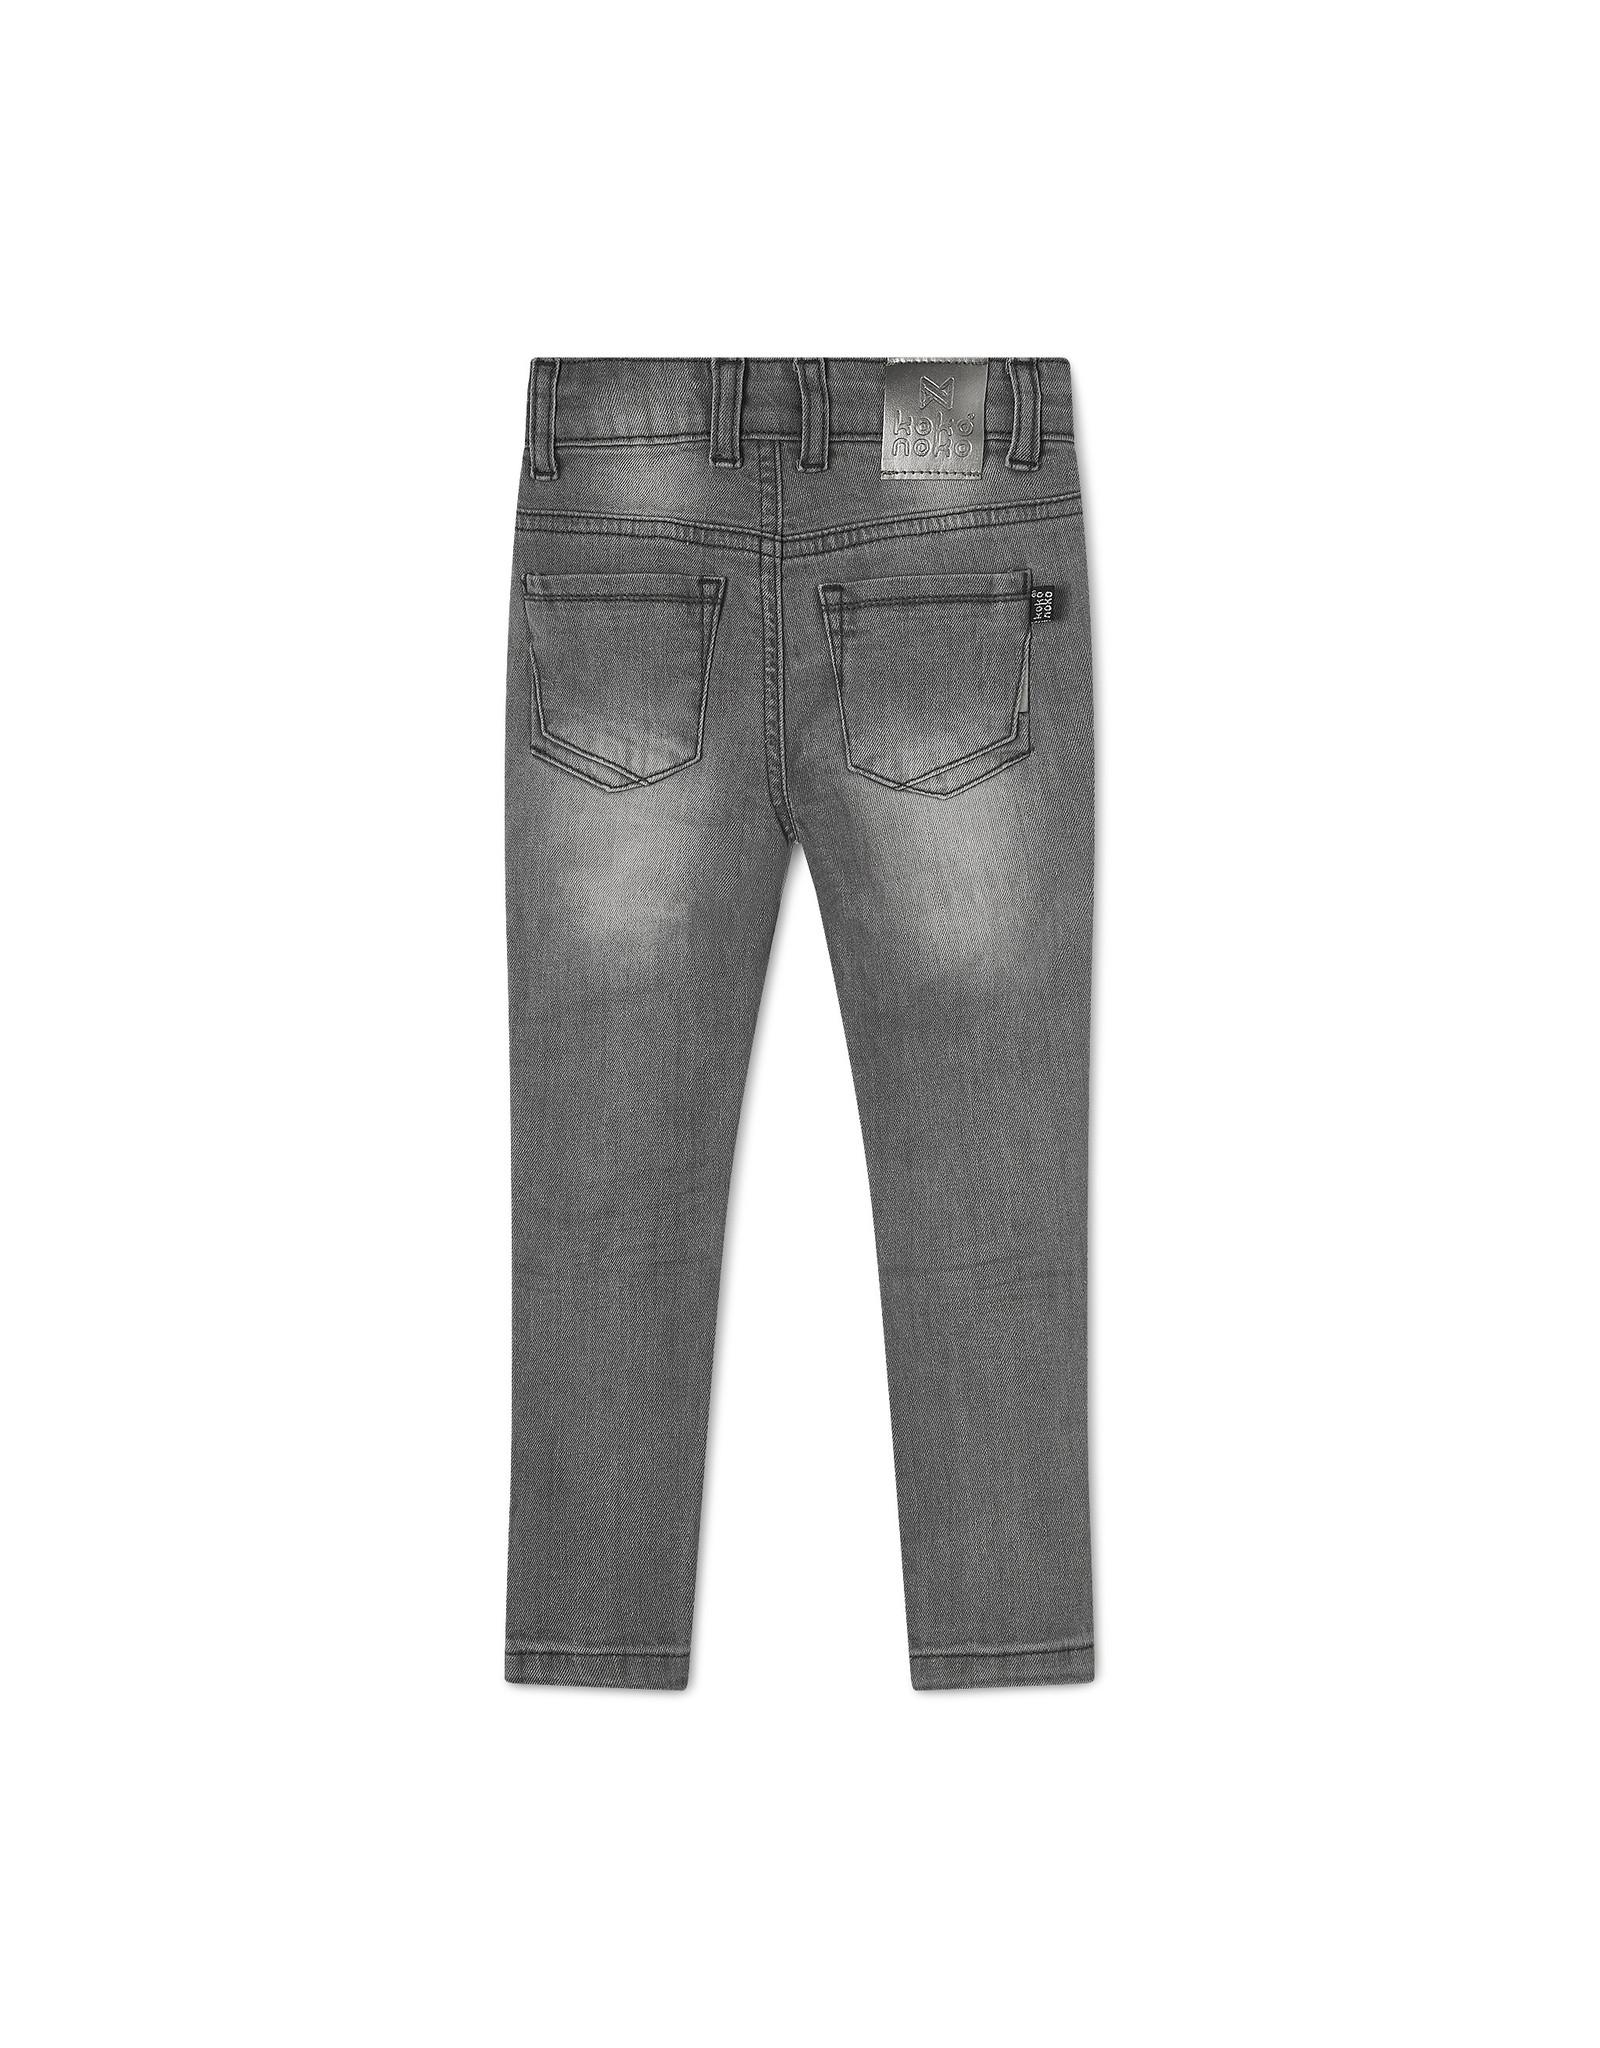 Koko Noko Girls Nelly jeans Grey jeans NOS